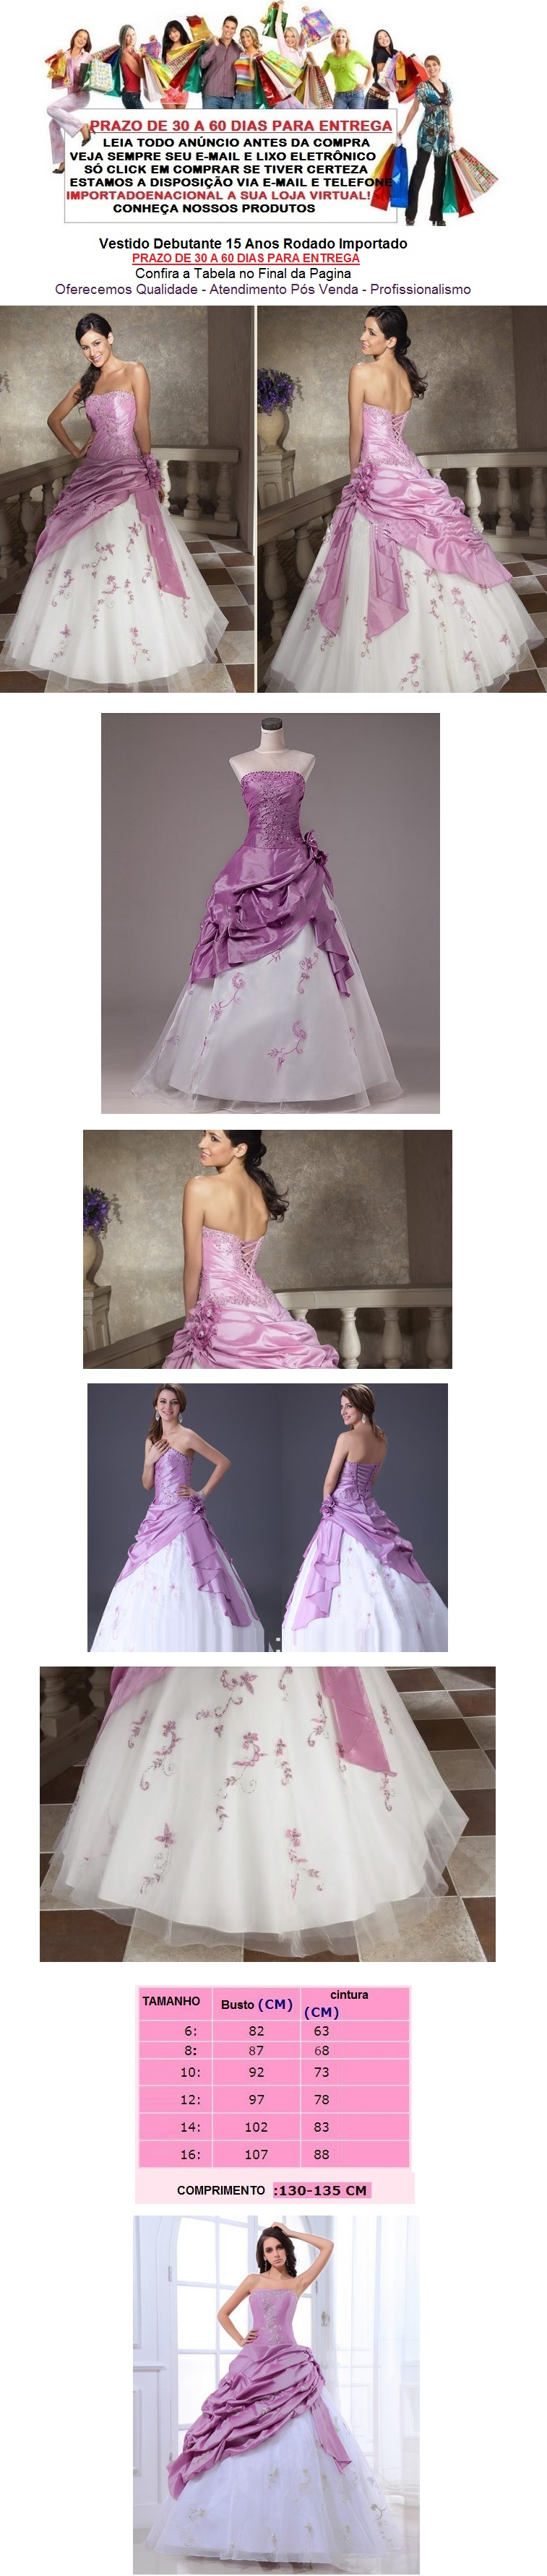 vestidodebuante15anosrodadoimportado.jpg